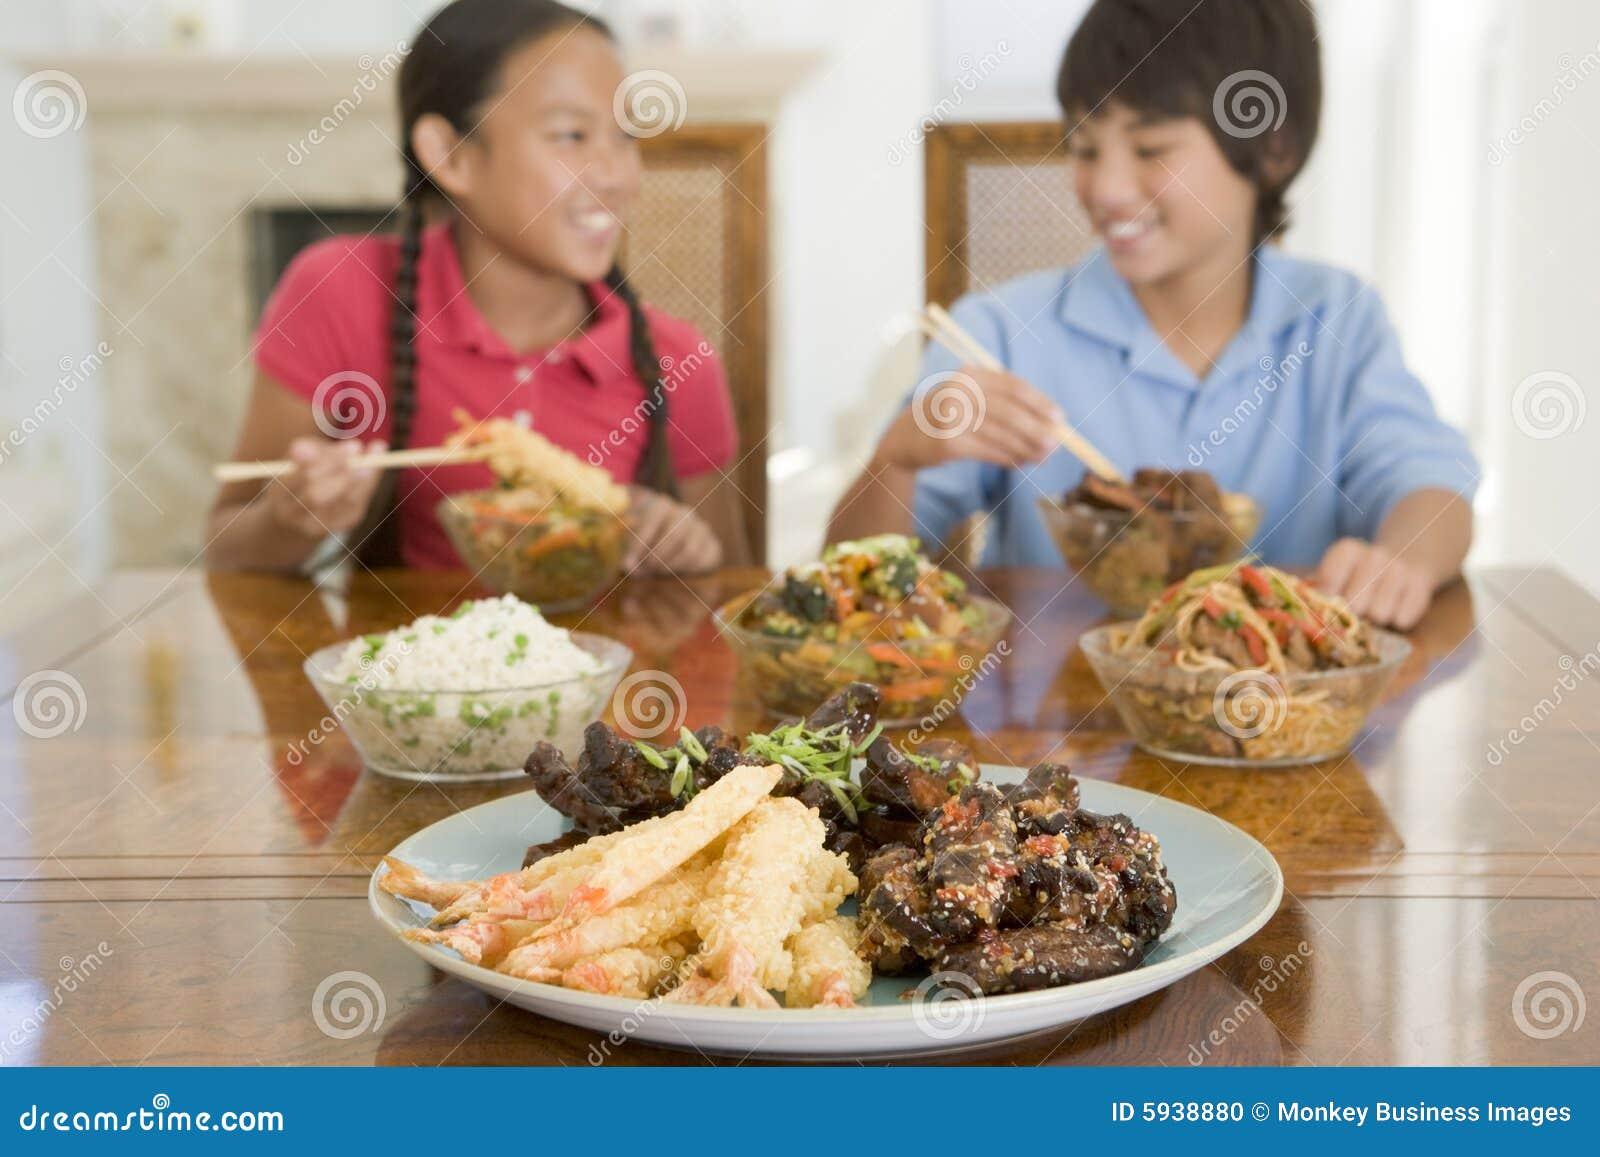 The Oriental Chinese Food Takeaway